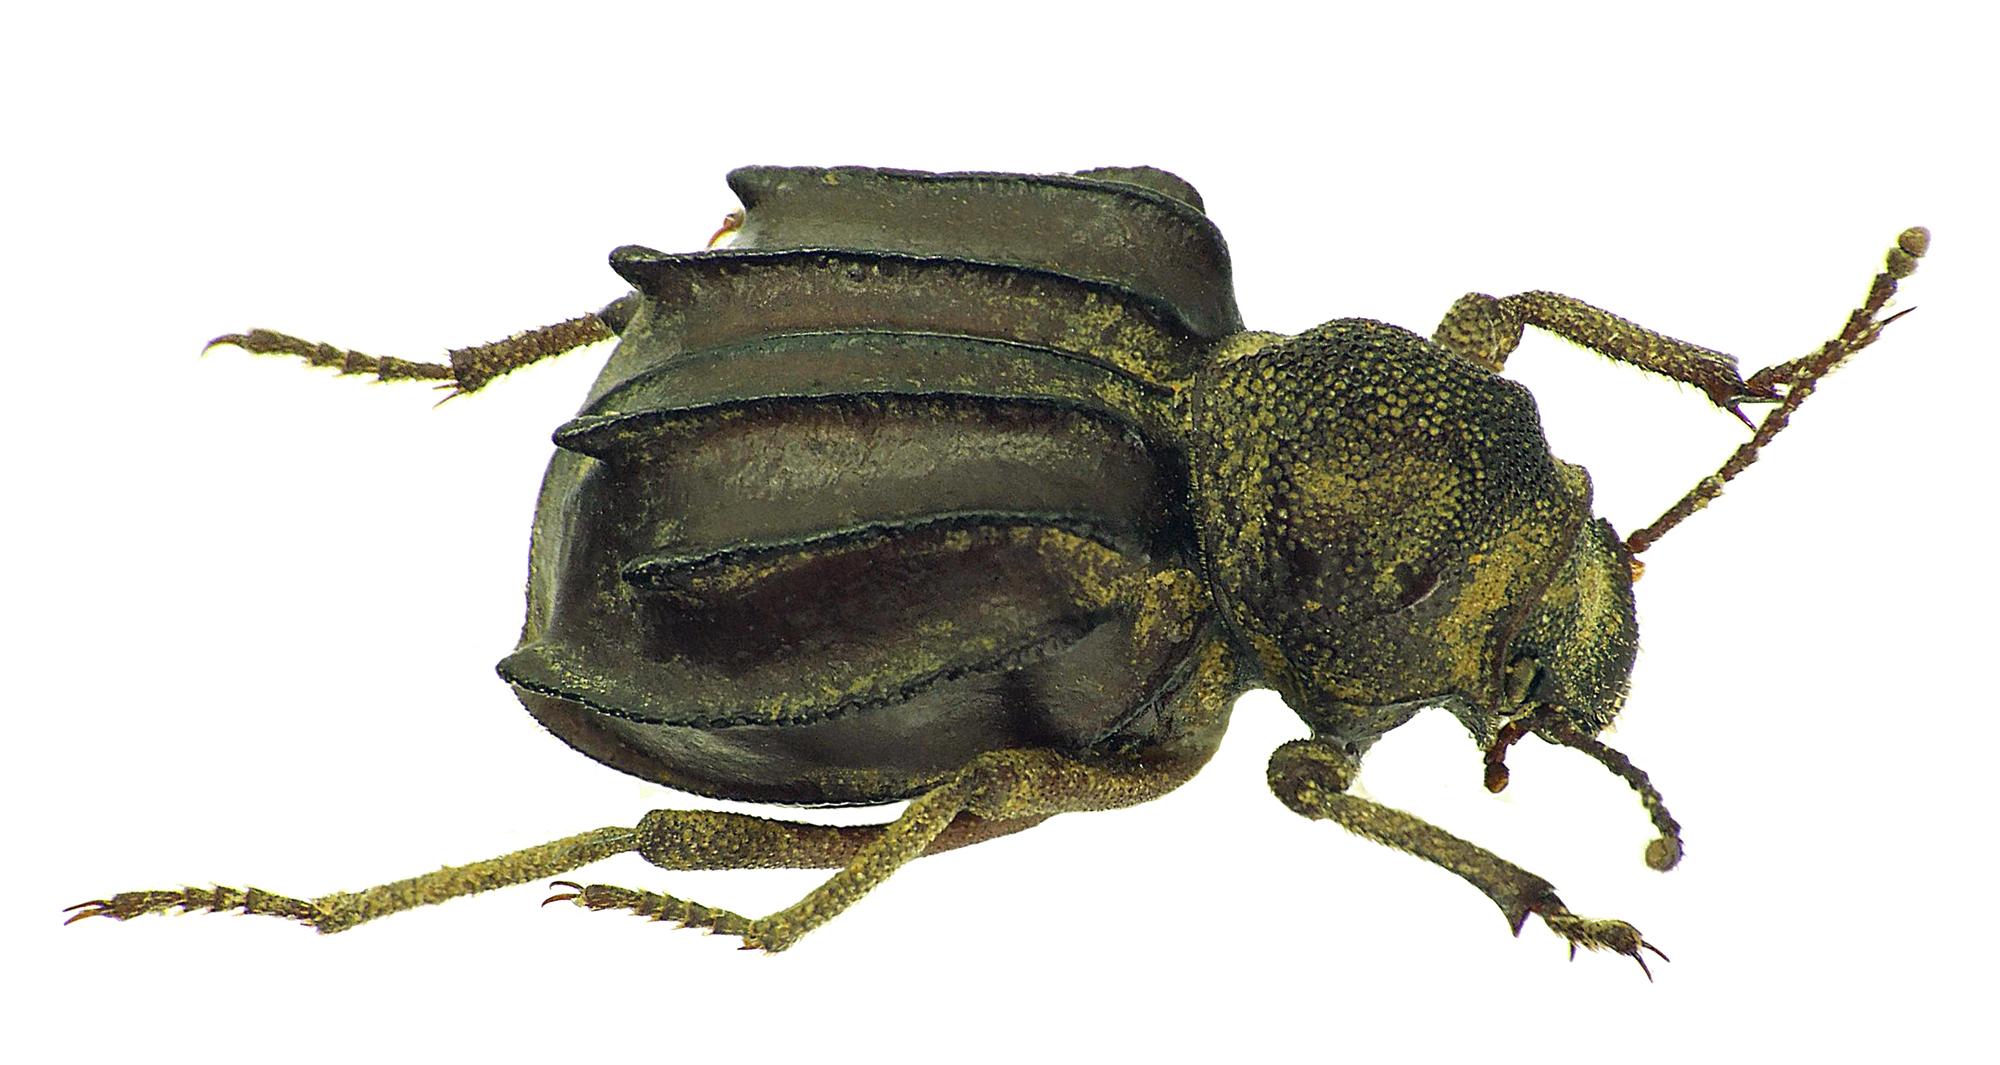 Euphrynus sexdentatus 24656cz63.jpg